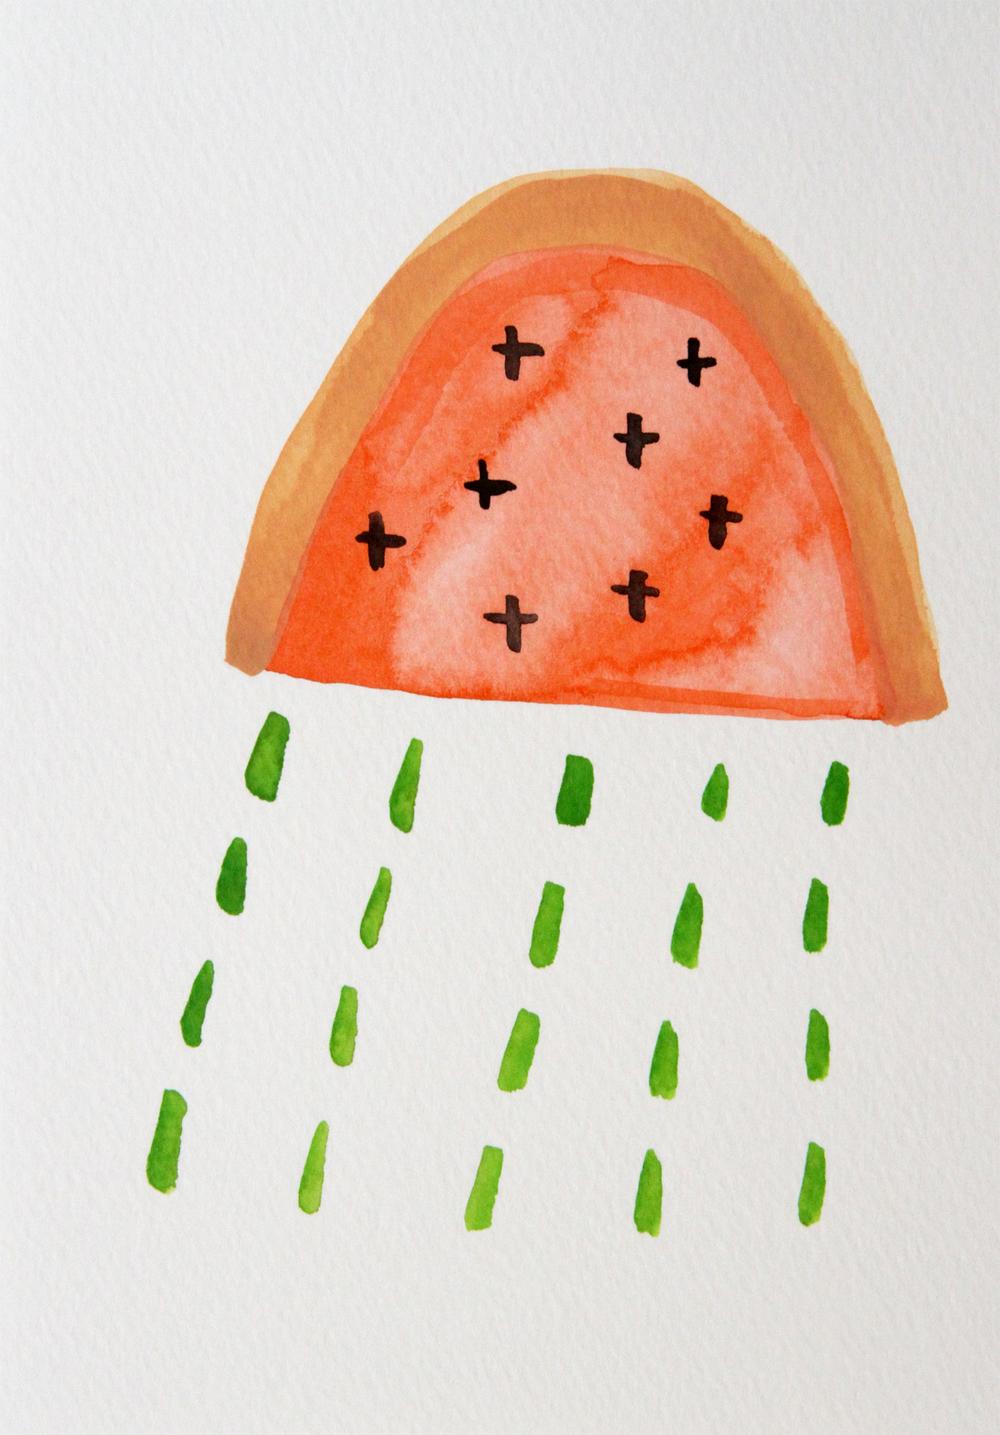 watermelon_satsukishibuya.jpg